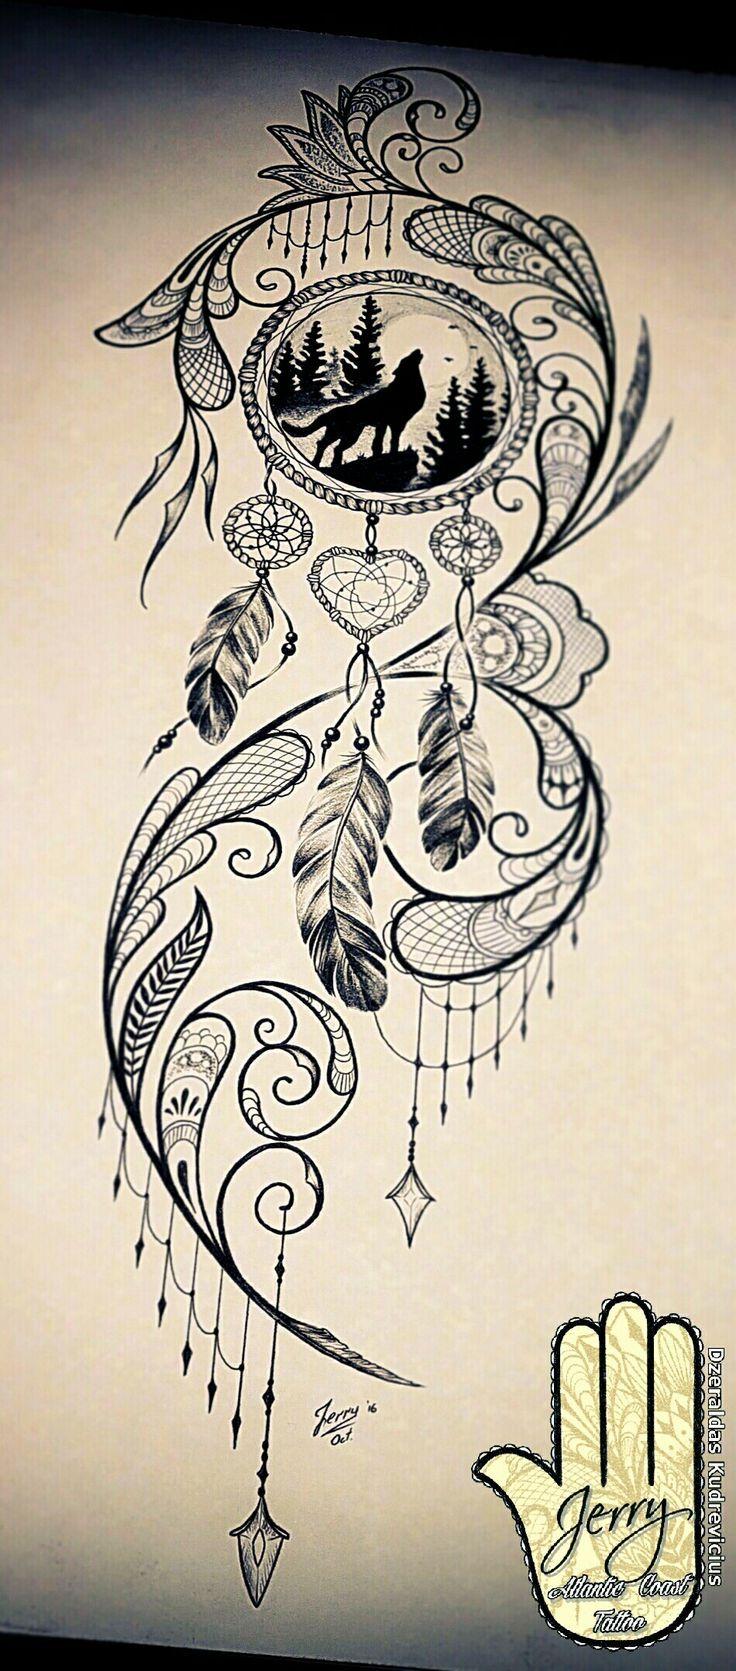 Slikovni Rezultat Za Dream Catcher Compass Tattoo Gfh Tatuaggi